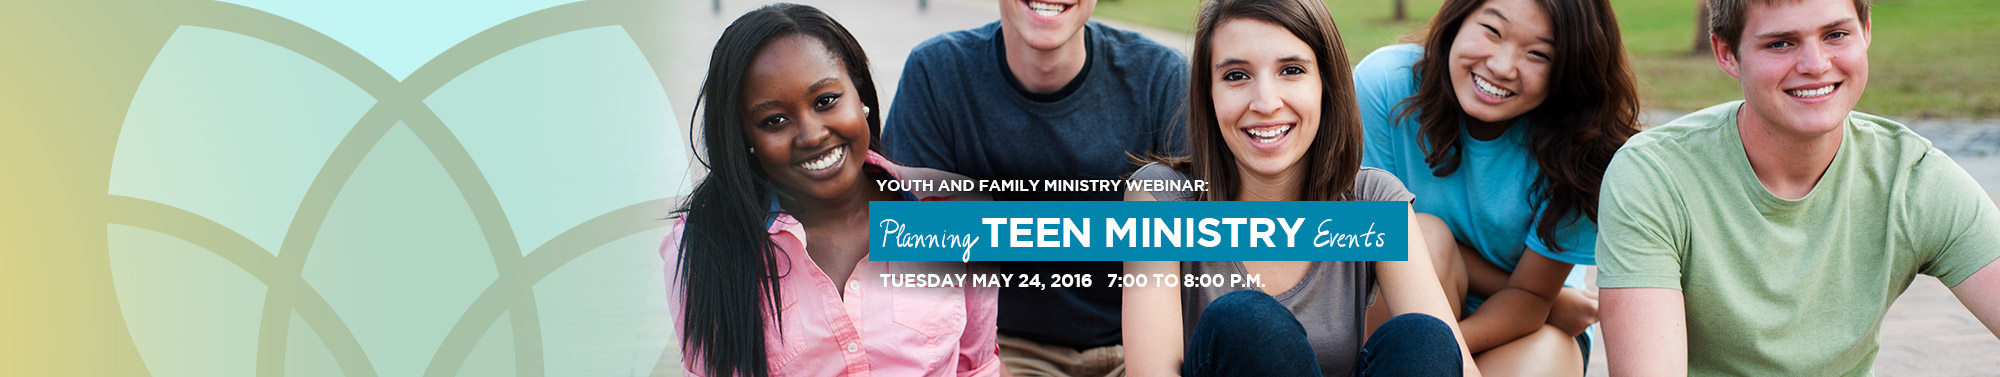 YFM Webinar - Teen Ministry Events